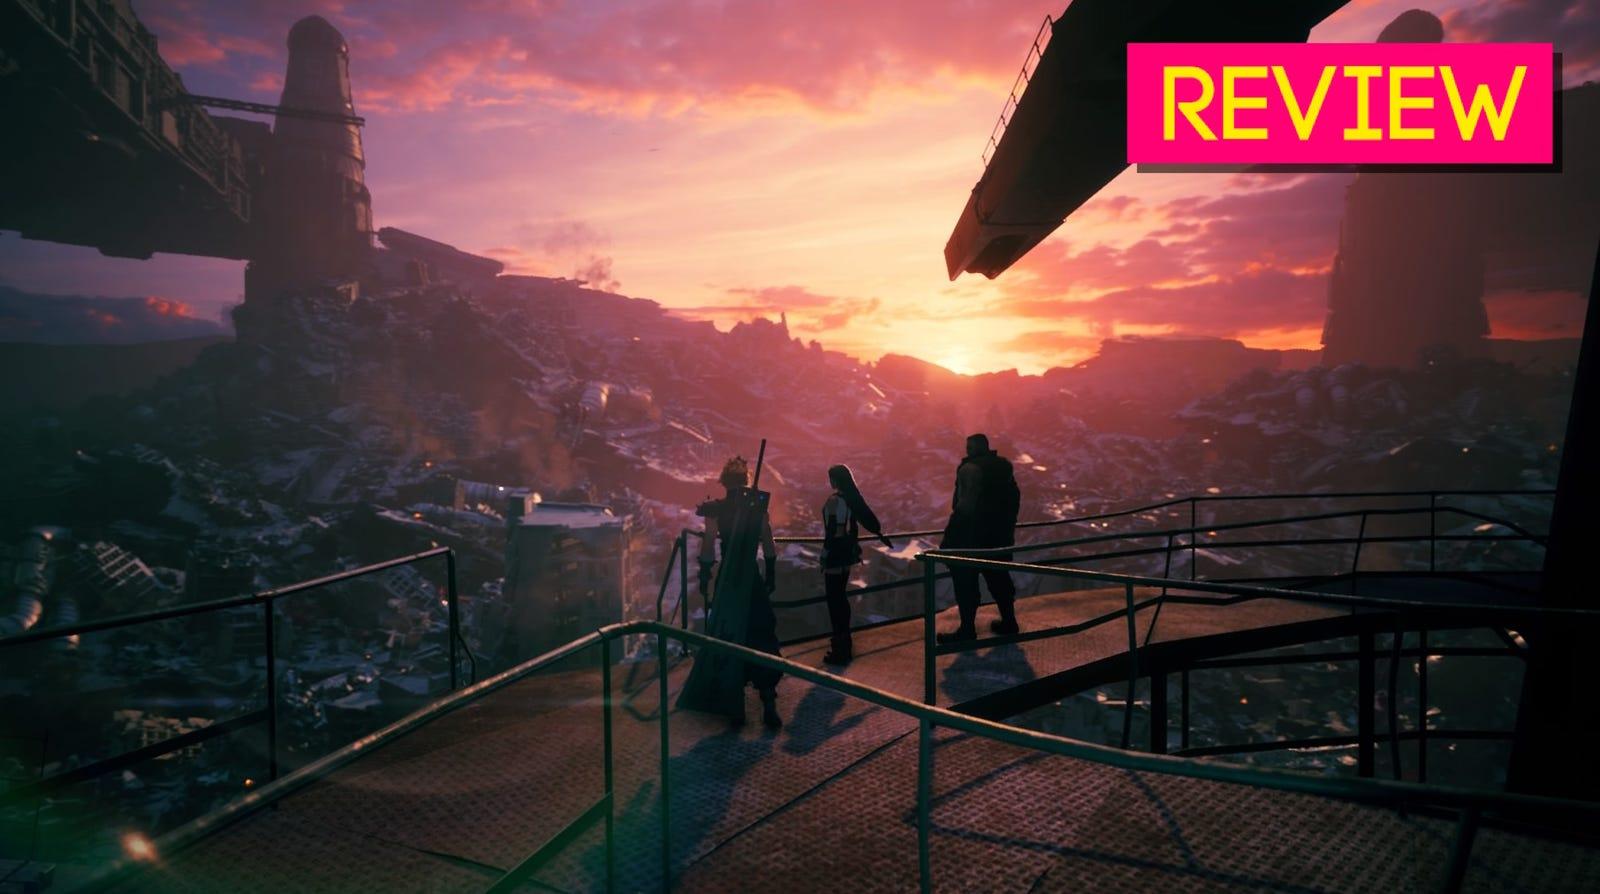 Final Fantasy VII Remake: The Kotaku Review